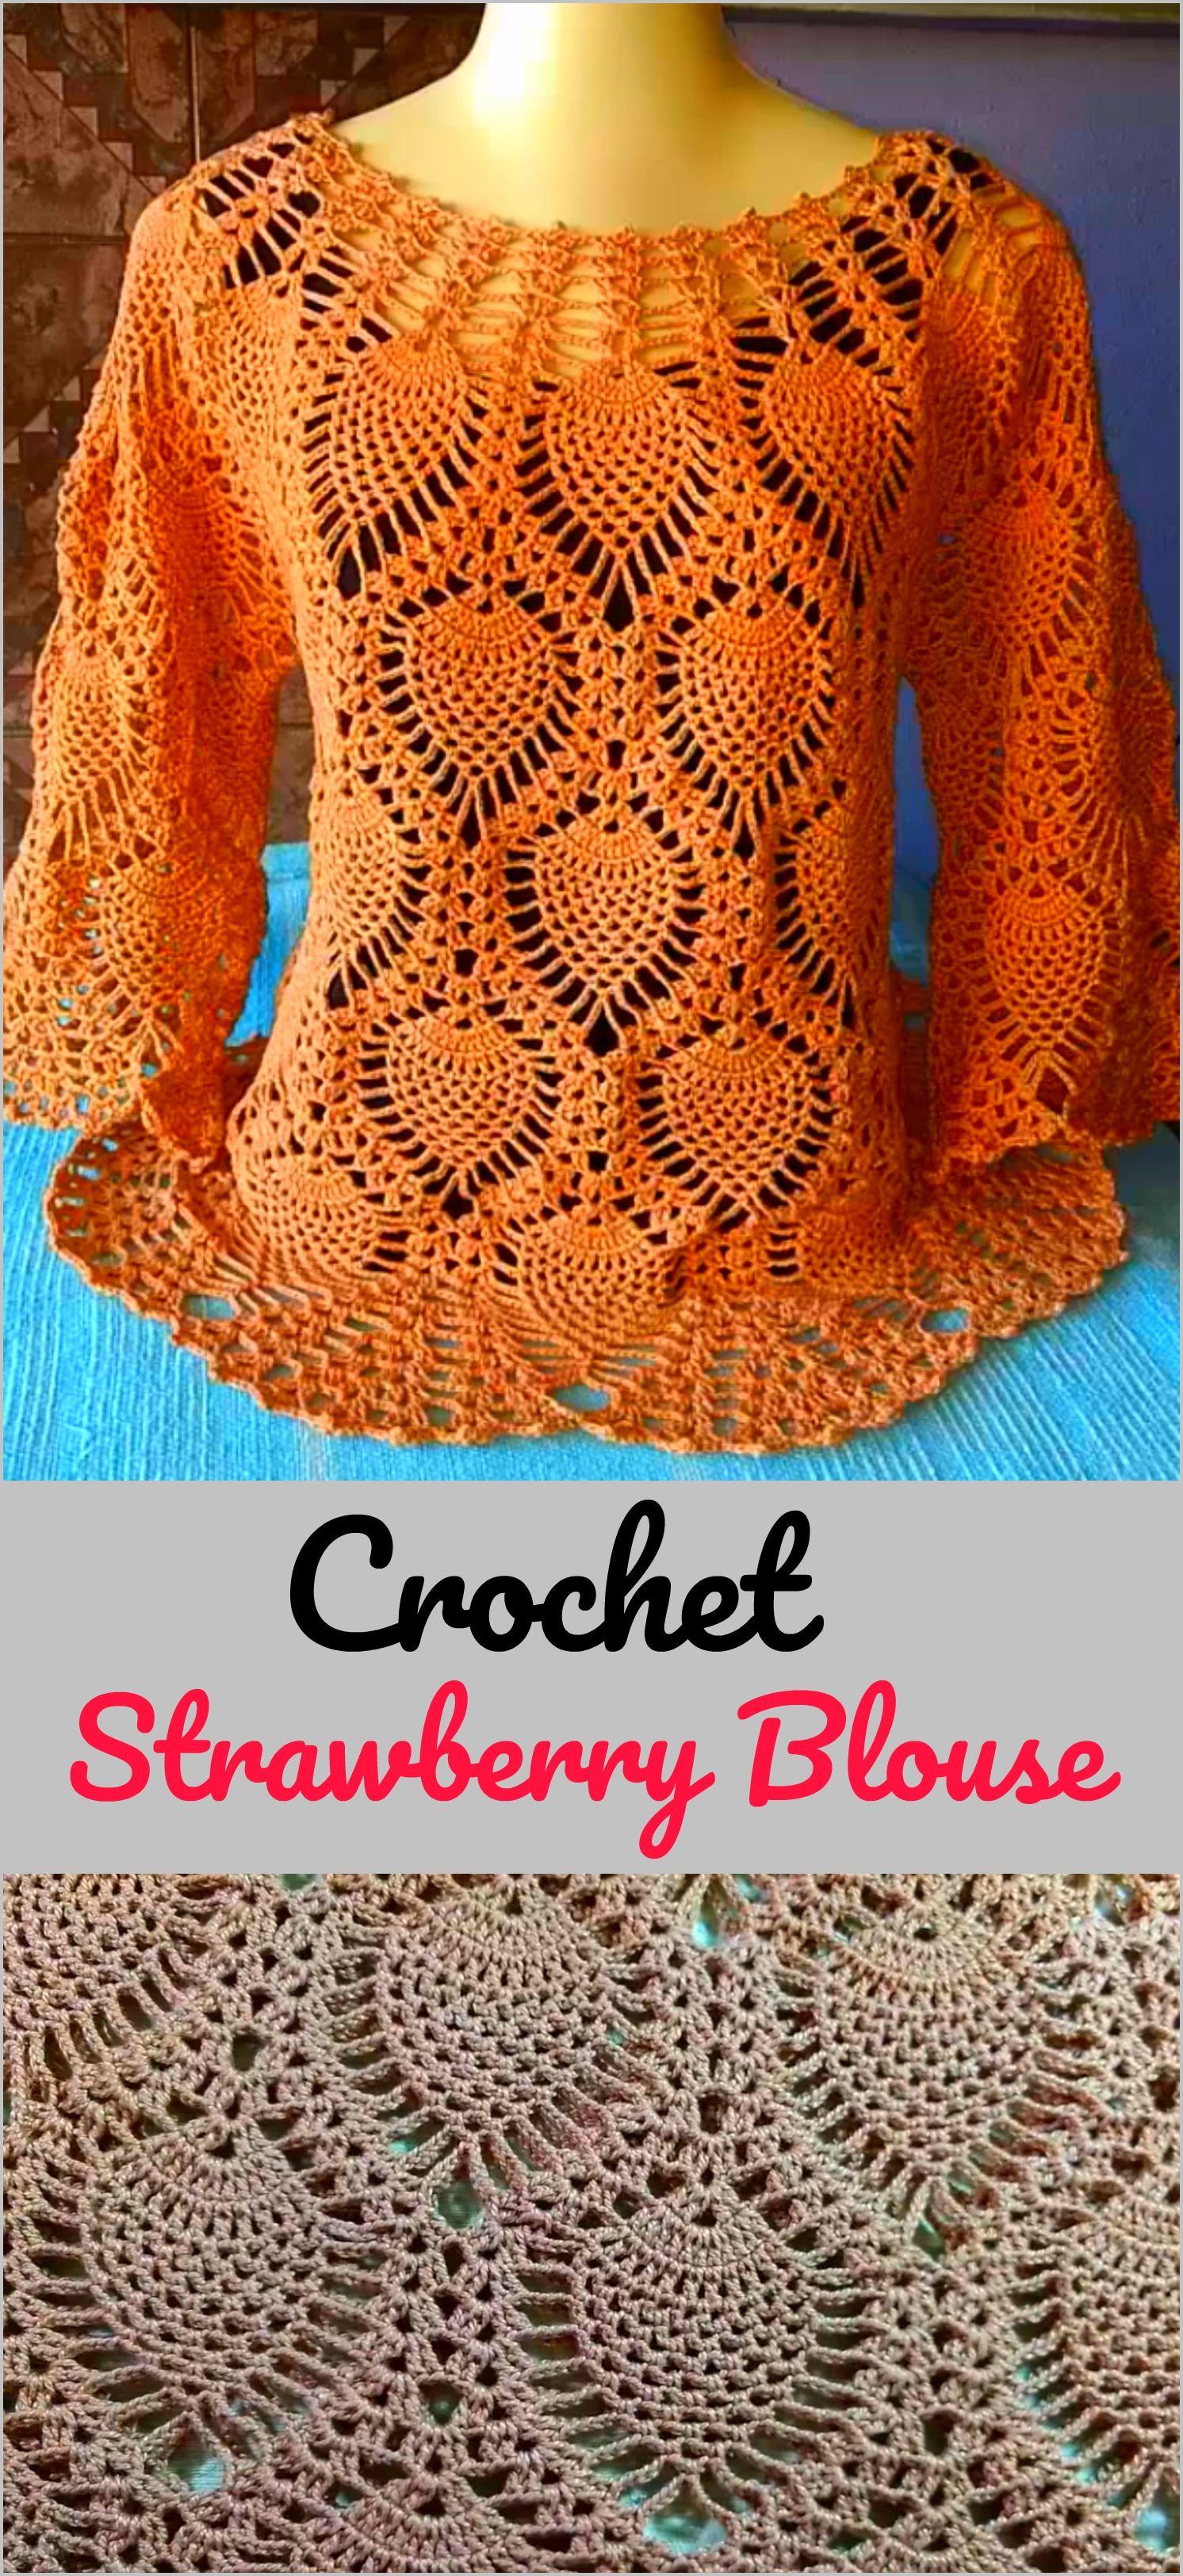 Crochet Strawberry Blouse | Crocheted things | Pinterest | Blusas ...